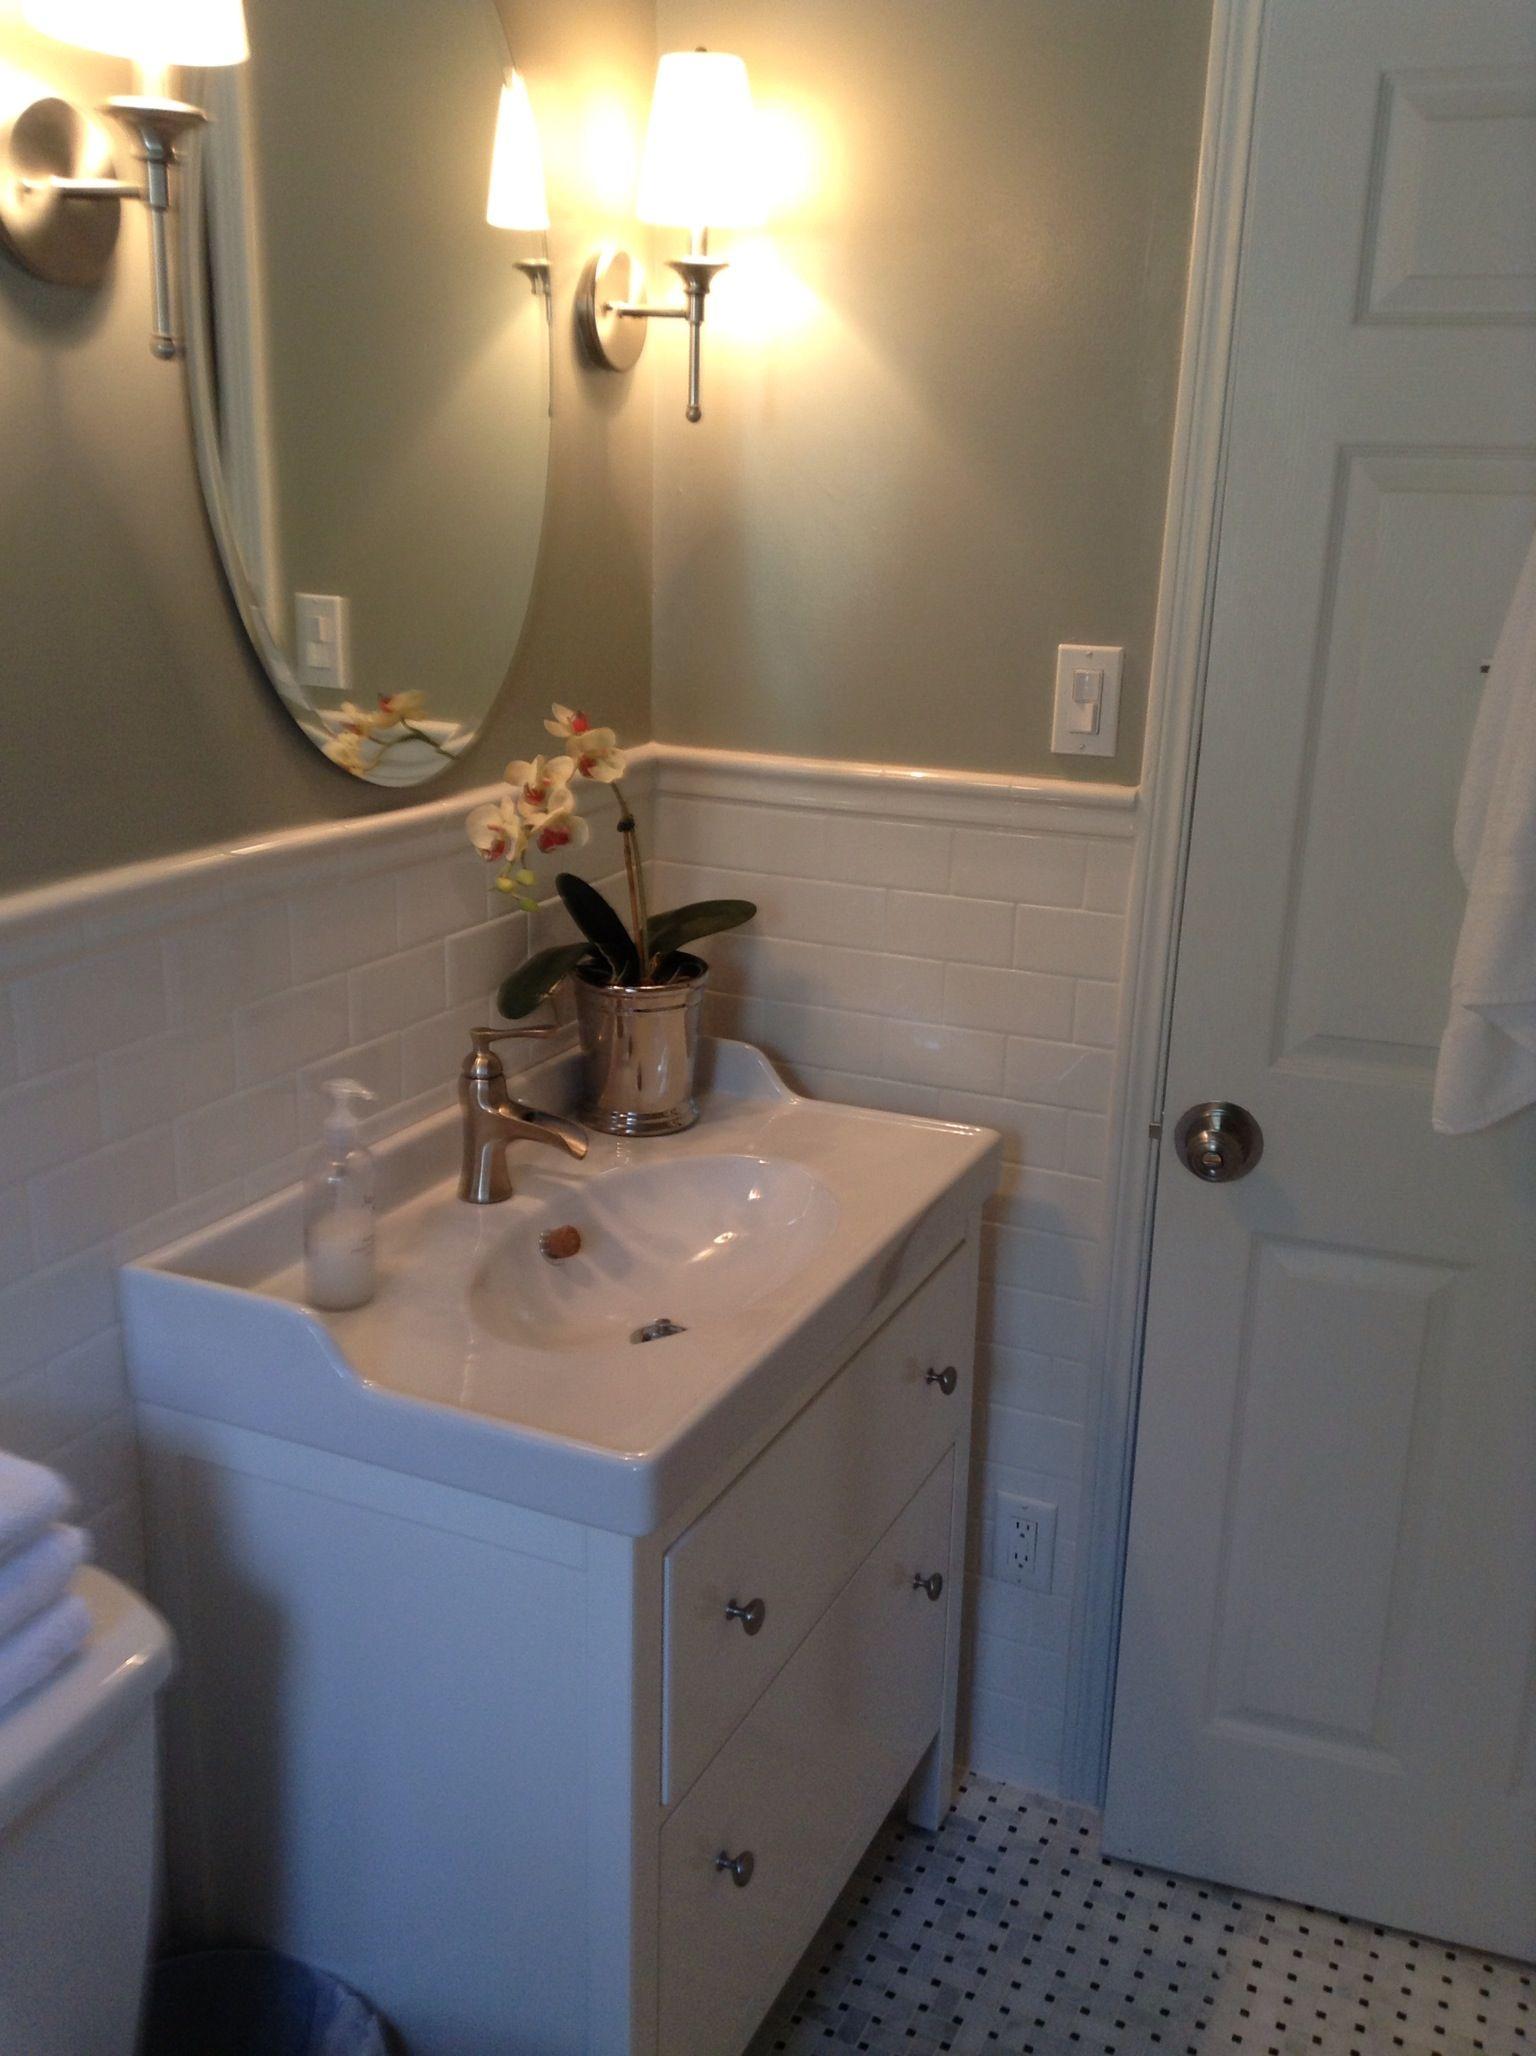 Ikea Bathroom sink Repair Renew Restore Pinterest